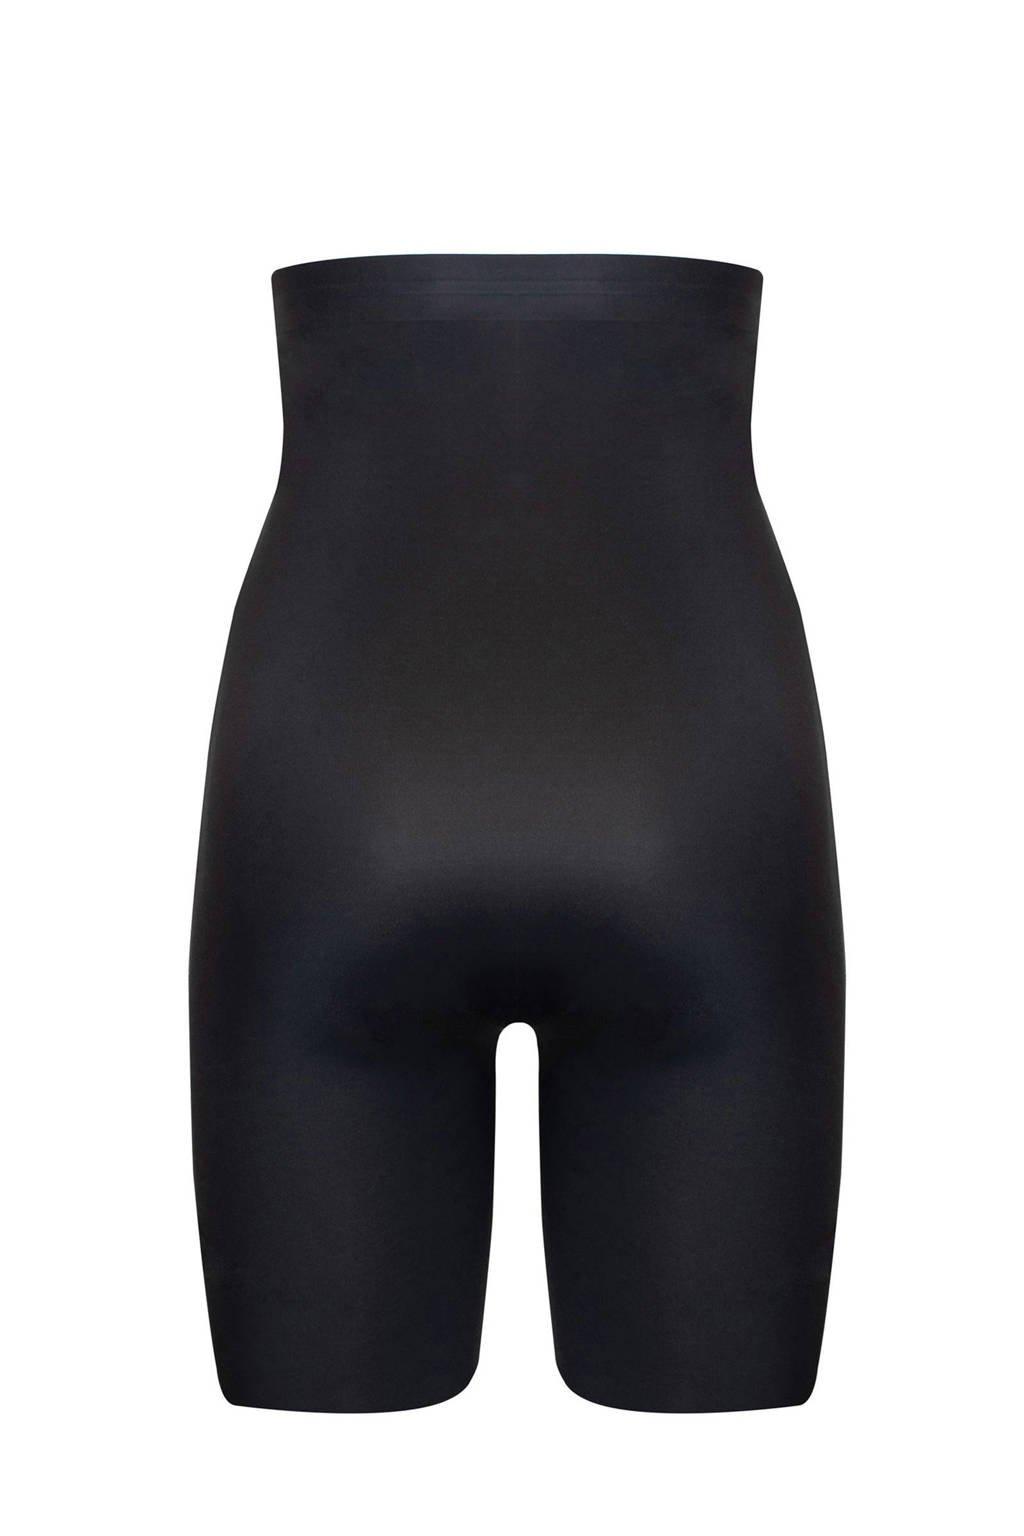 MAGIC Bodyfashion naadloze corrigerende short zwart, Zwart